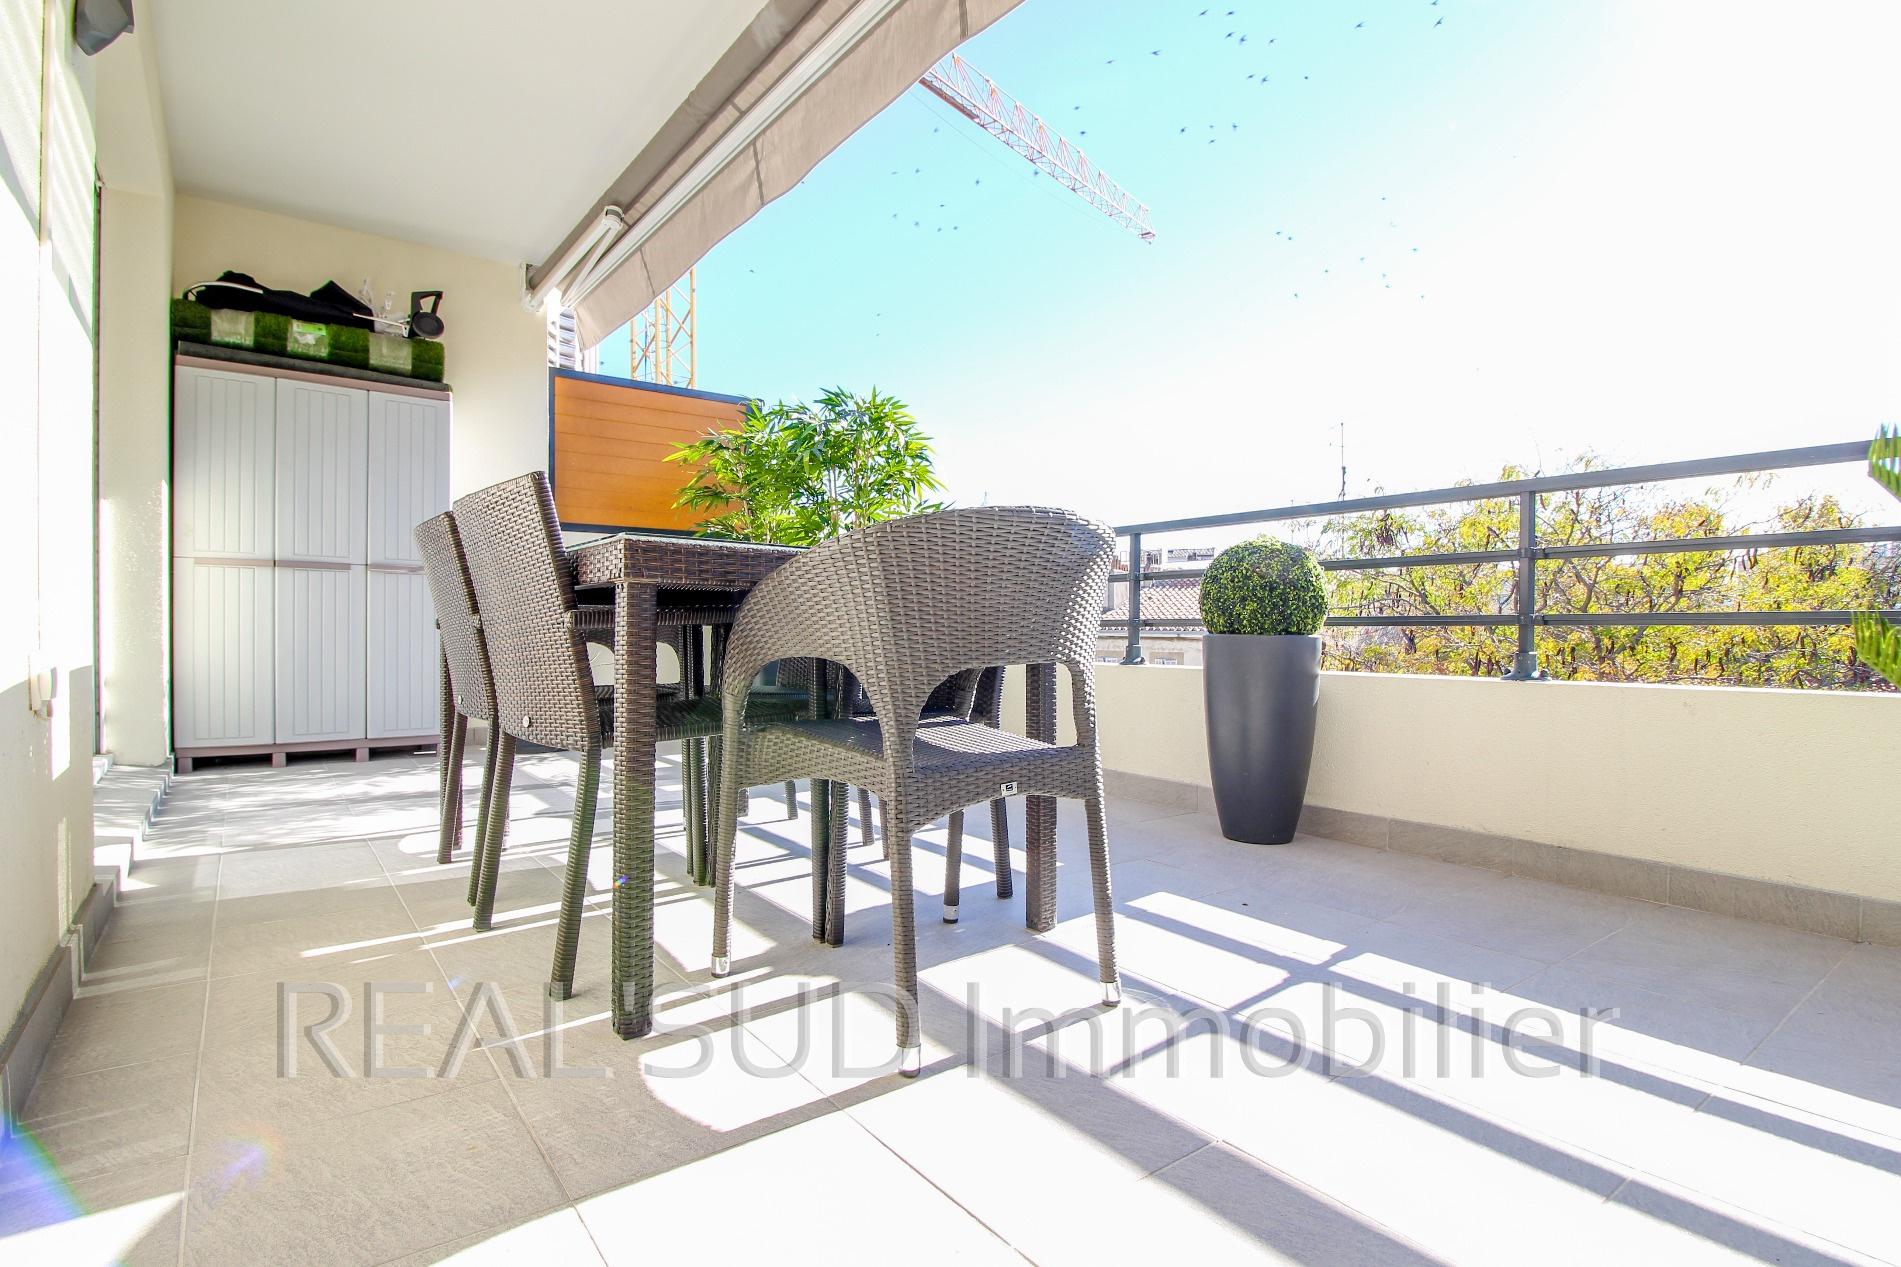 vente marseille 8e t3 dernier tage terrasse. Black Bedroom Furniture Sets. Home Design Ideas